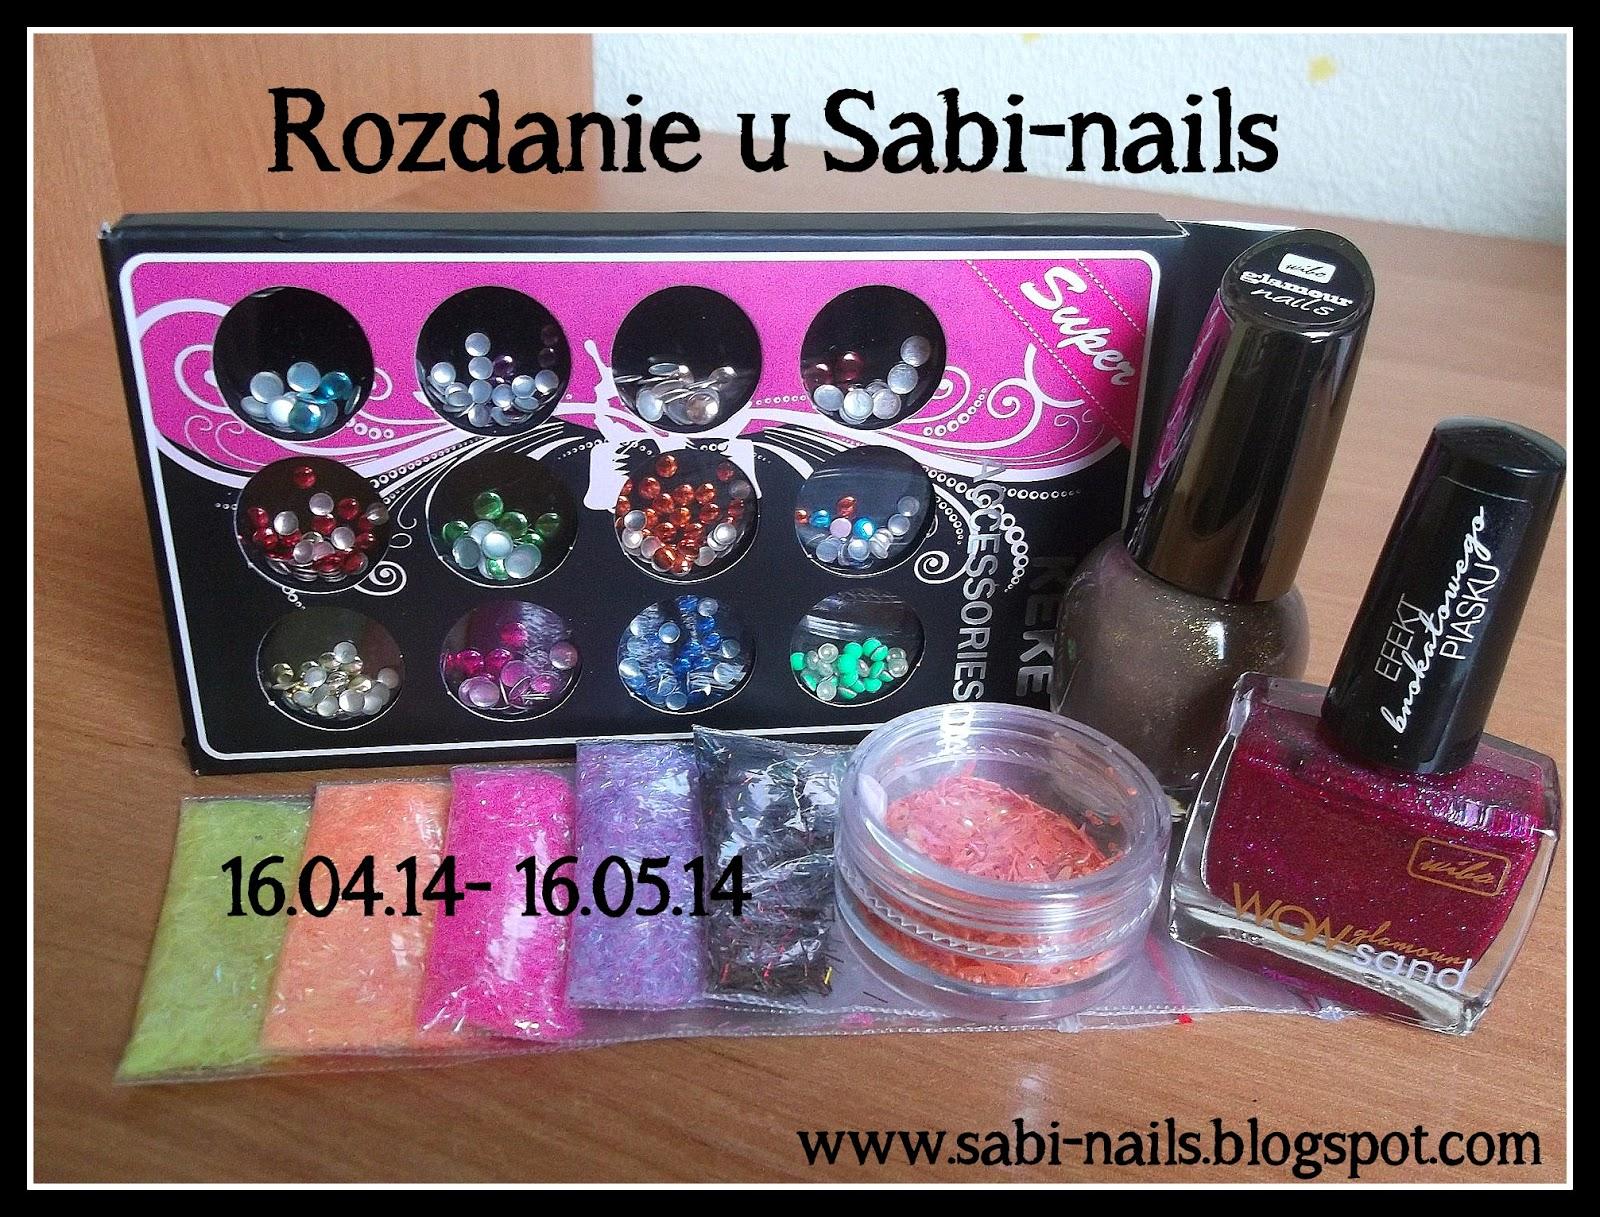 http://sabi-nails.blogspot.com/2014/04/dobre-wiadomosci-rozdanie.html